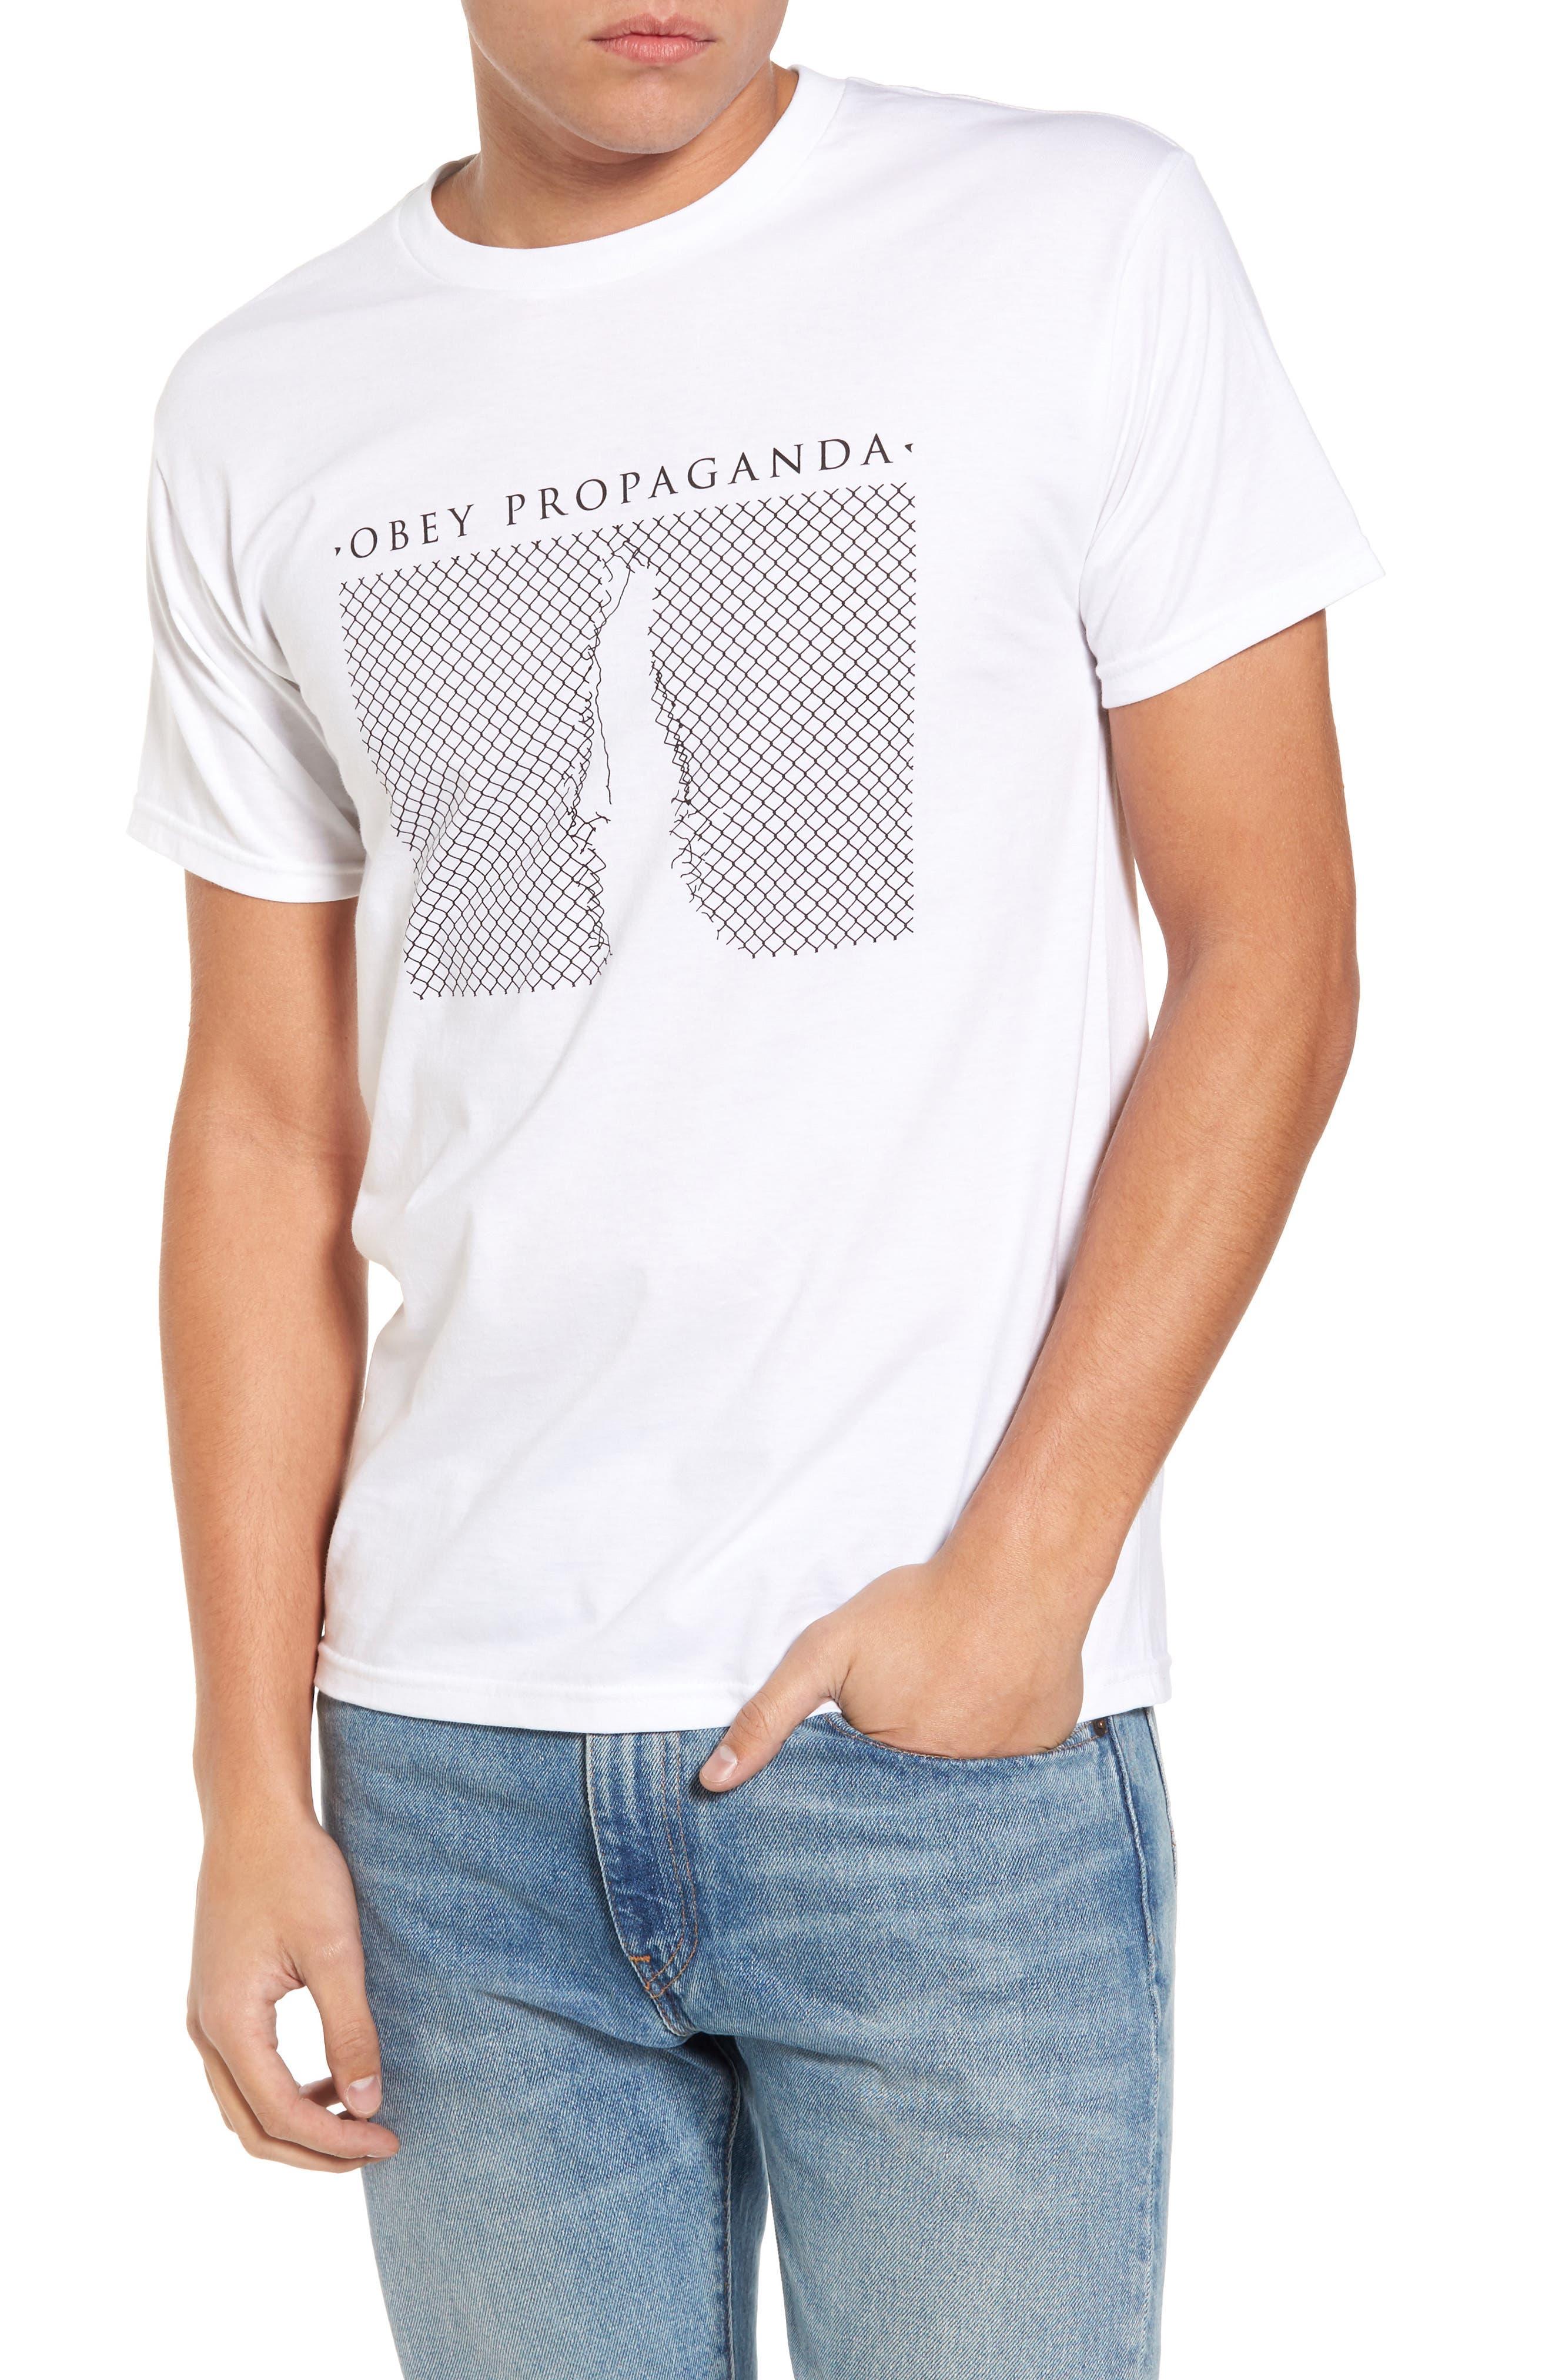 VIP Premium T-Shirt,                             Main thumbnail 1, color,                             100